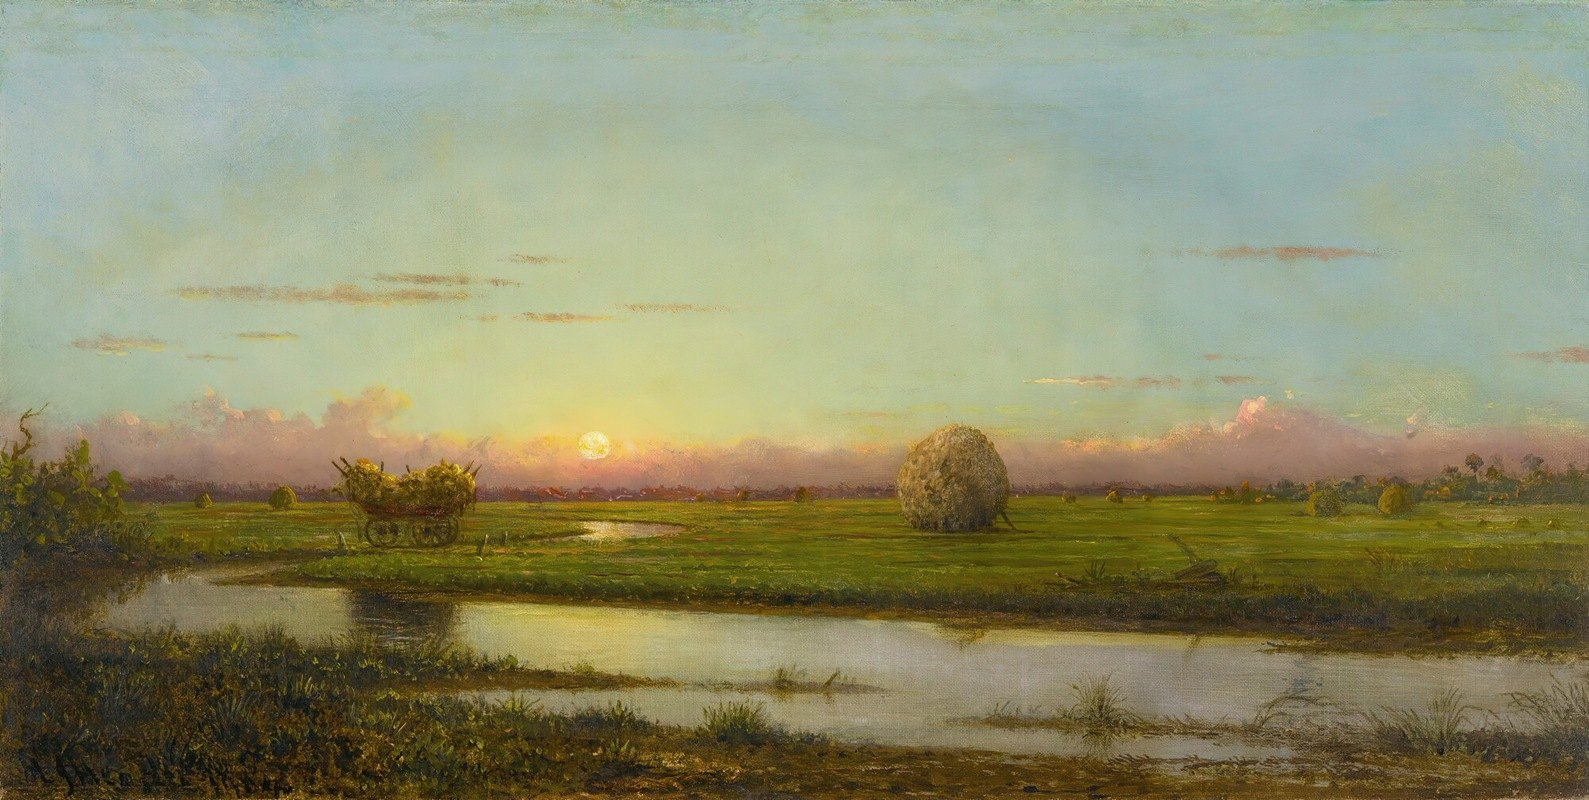 Martin Johnson Heade - Sunset Over Newburyport Meadows